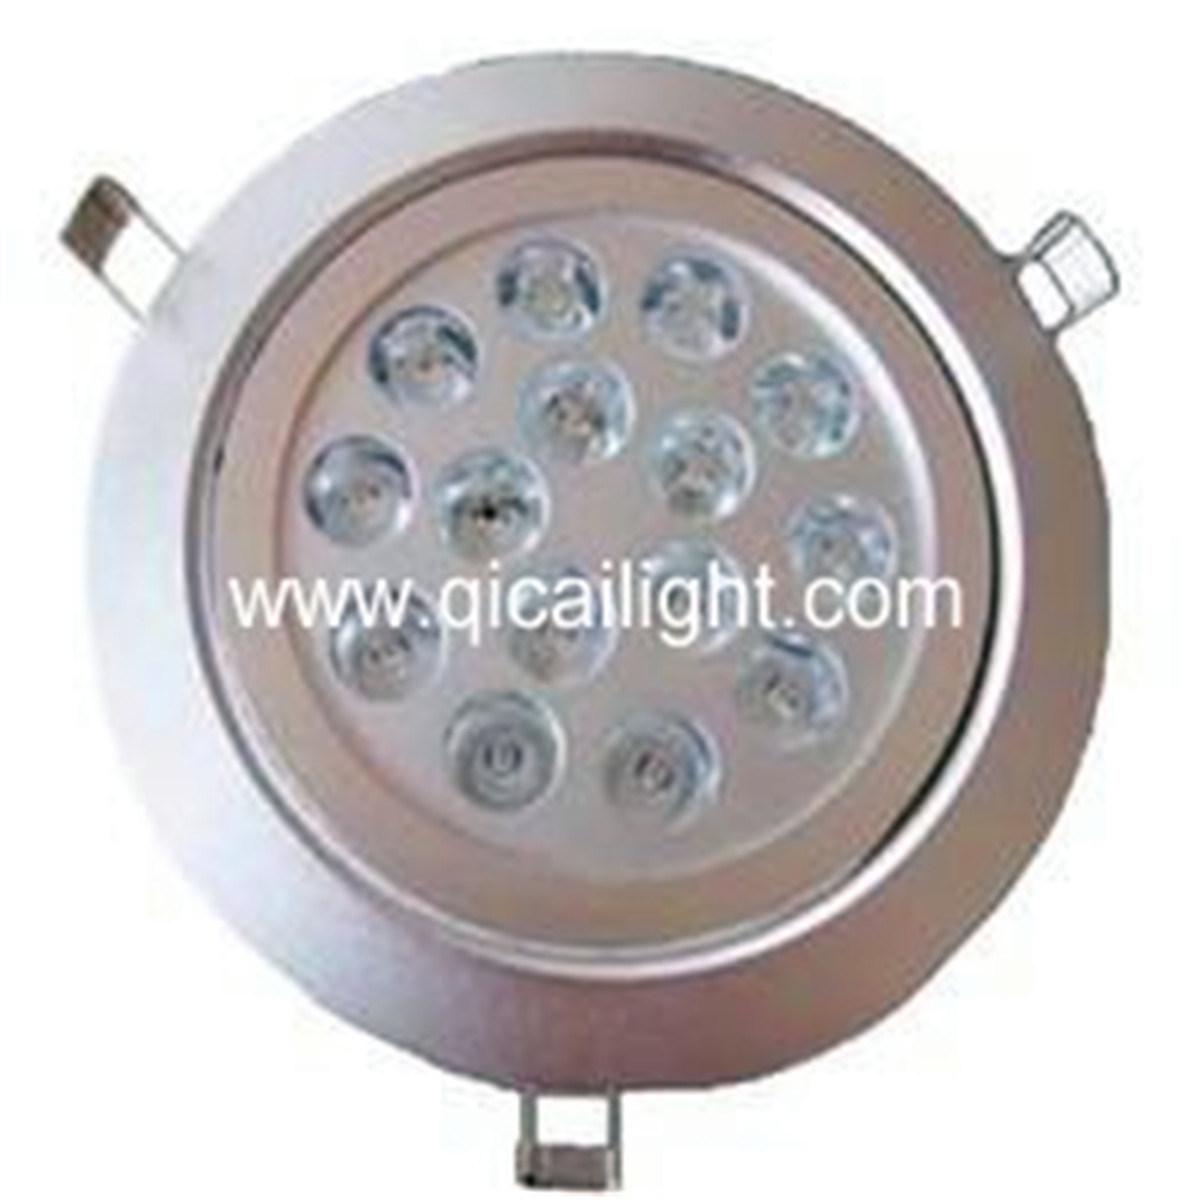 3X2W High Power LED Downlight 3 Years Warranty